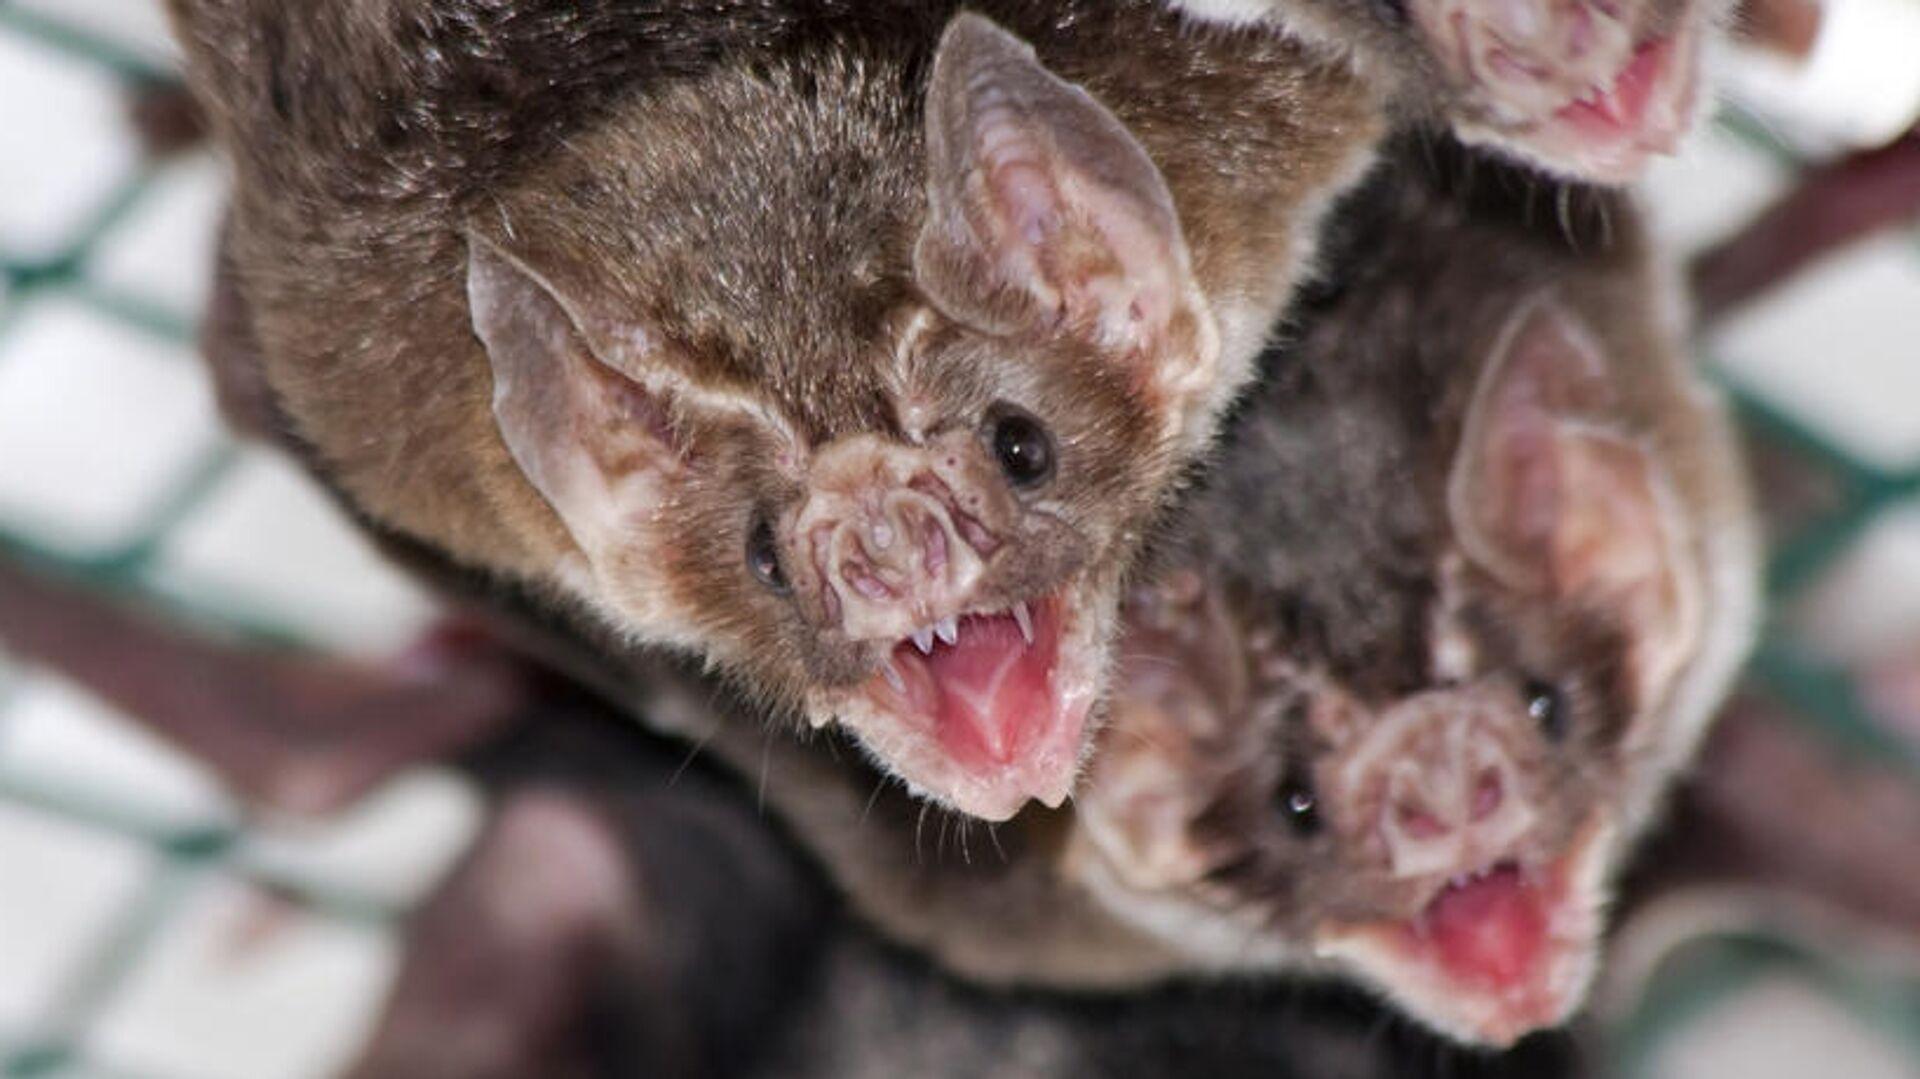 Vampire bat allogrooming - Sputnik International, 1920, 09.10.2021